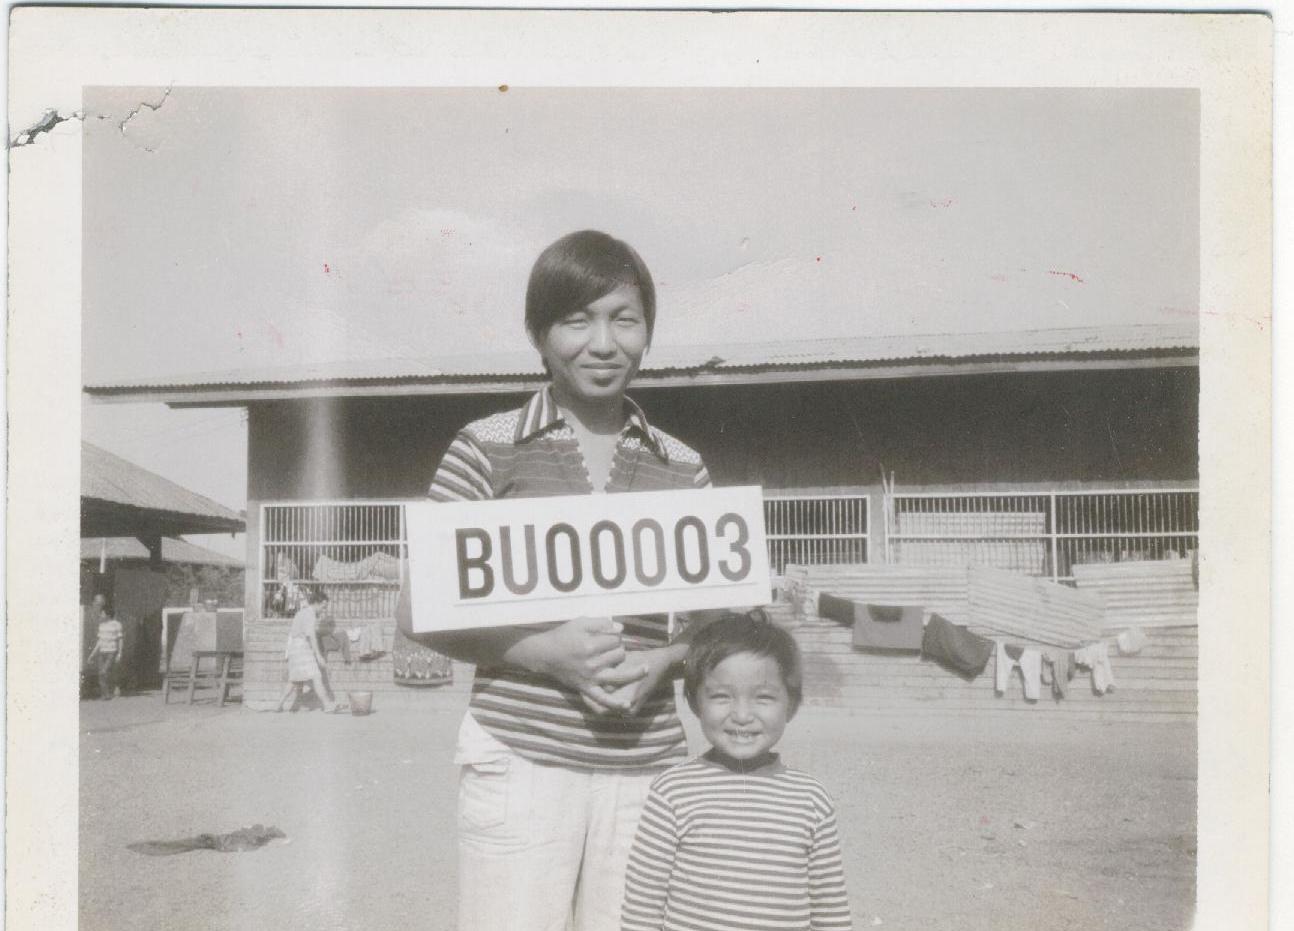 Bunseng with his nephew in Buriram Refugee Camp (1980).